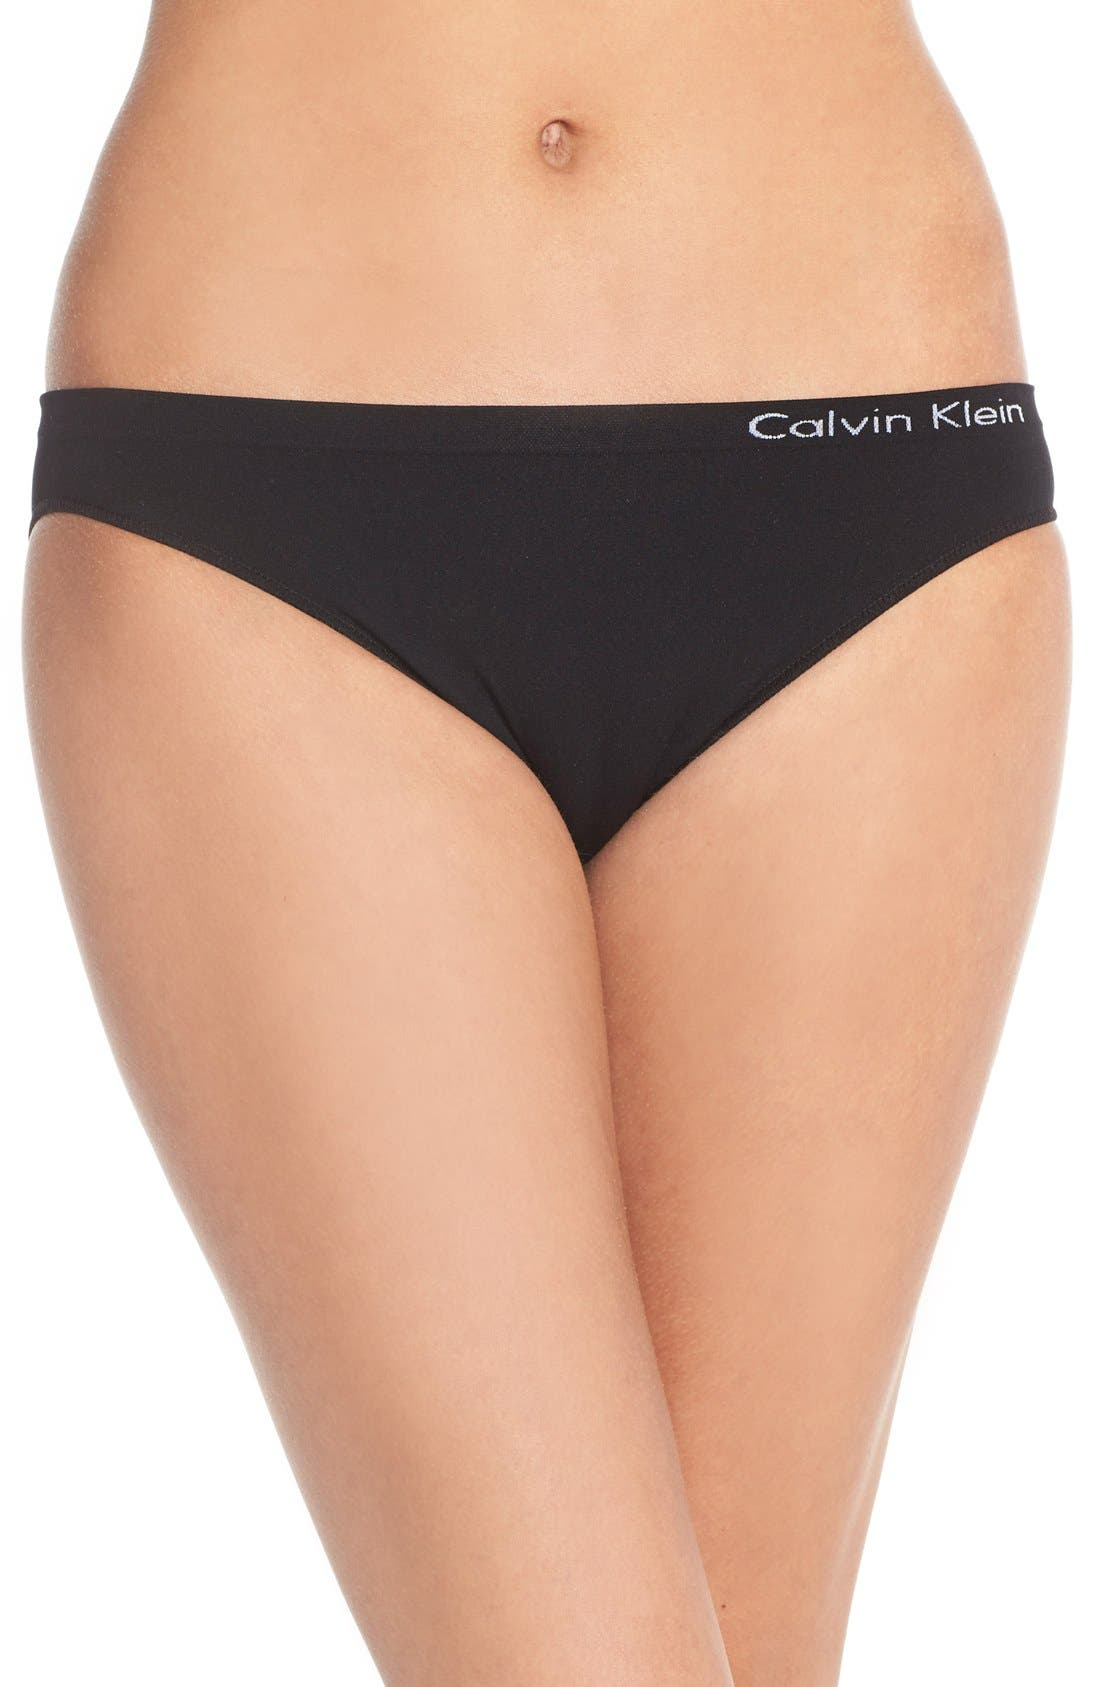 CALVIN KLEIN, 'Pure' Seamless Bikini, Main thumbnail 1, color, BLACK